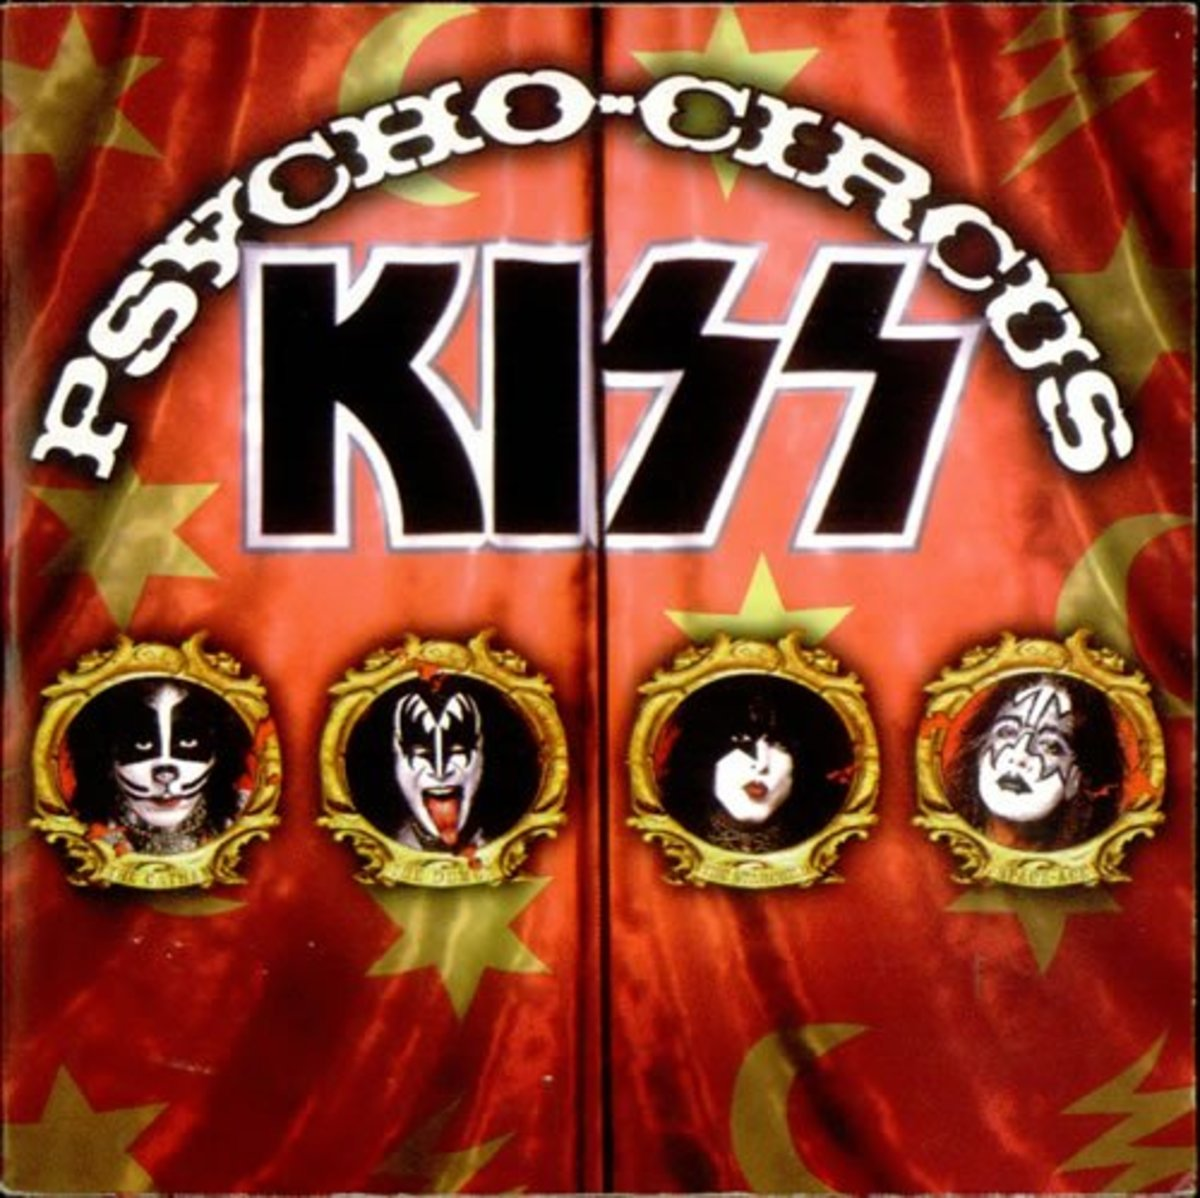 kiss-psycho-circus-1998-album-review